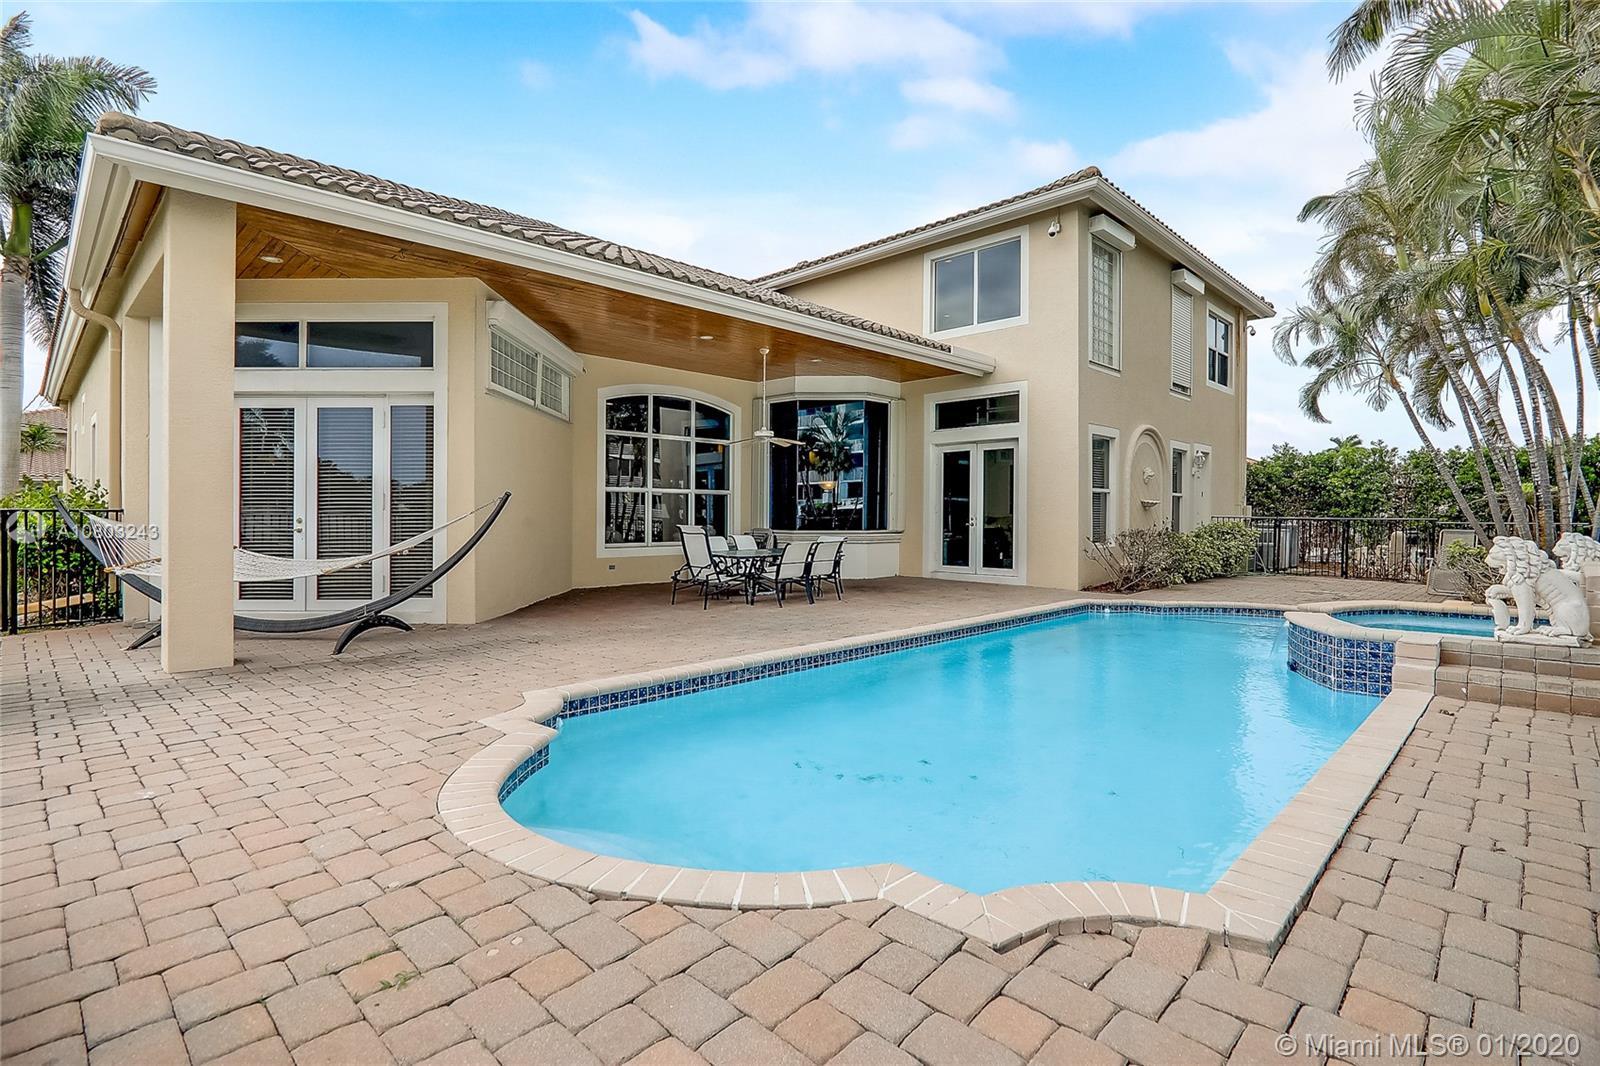 3091 NE 47th St - Fort Lauderdale, Florida